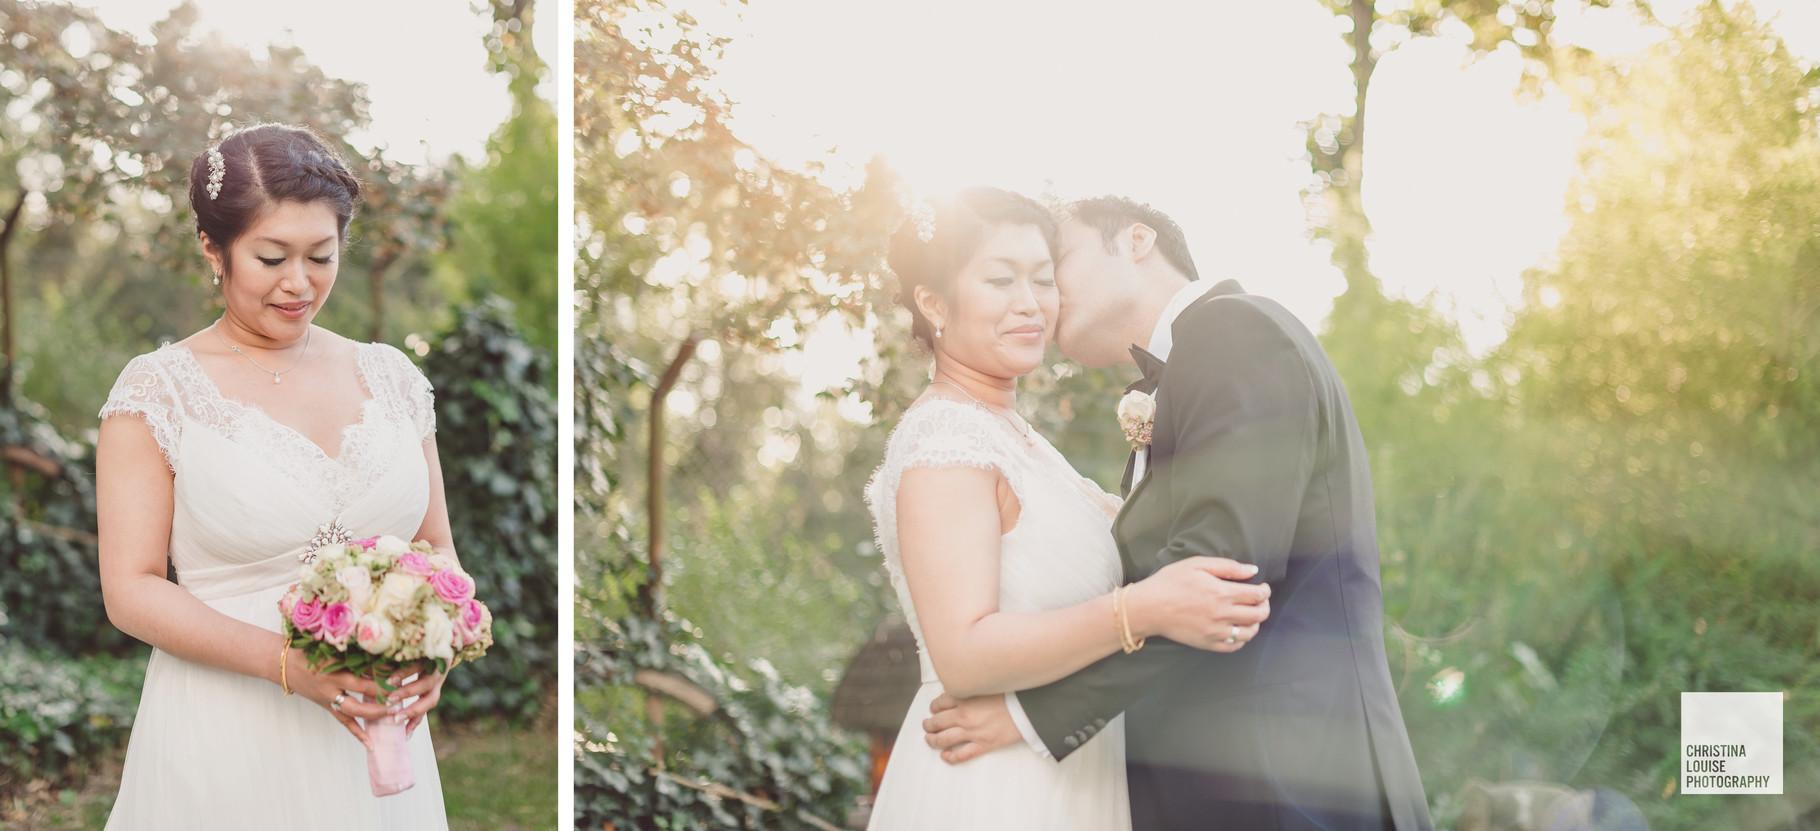 Photo: Christina Louise Photography // Model: Hung & Sinji